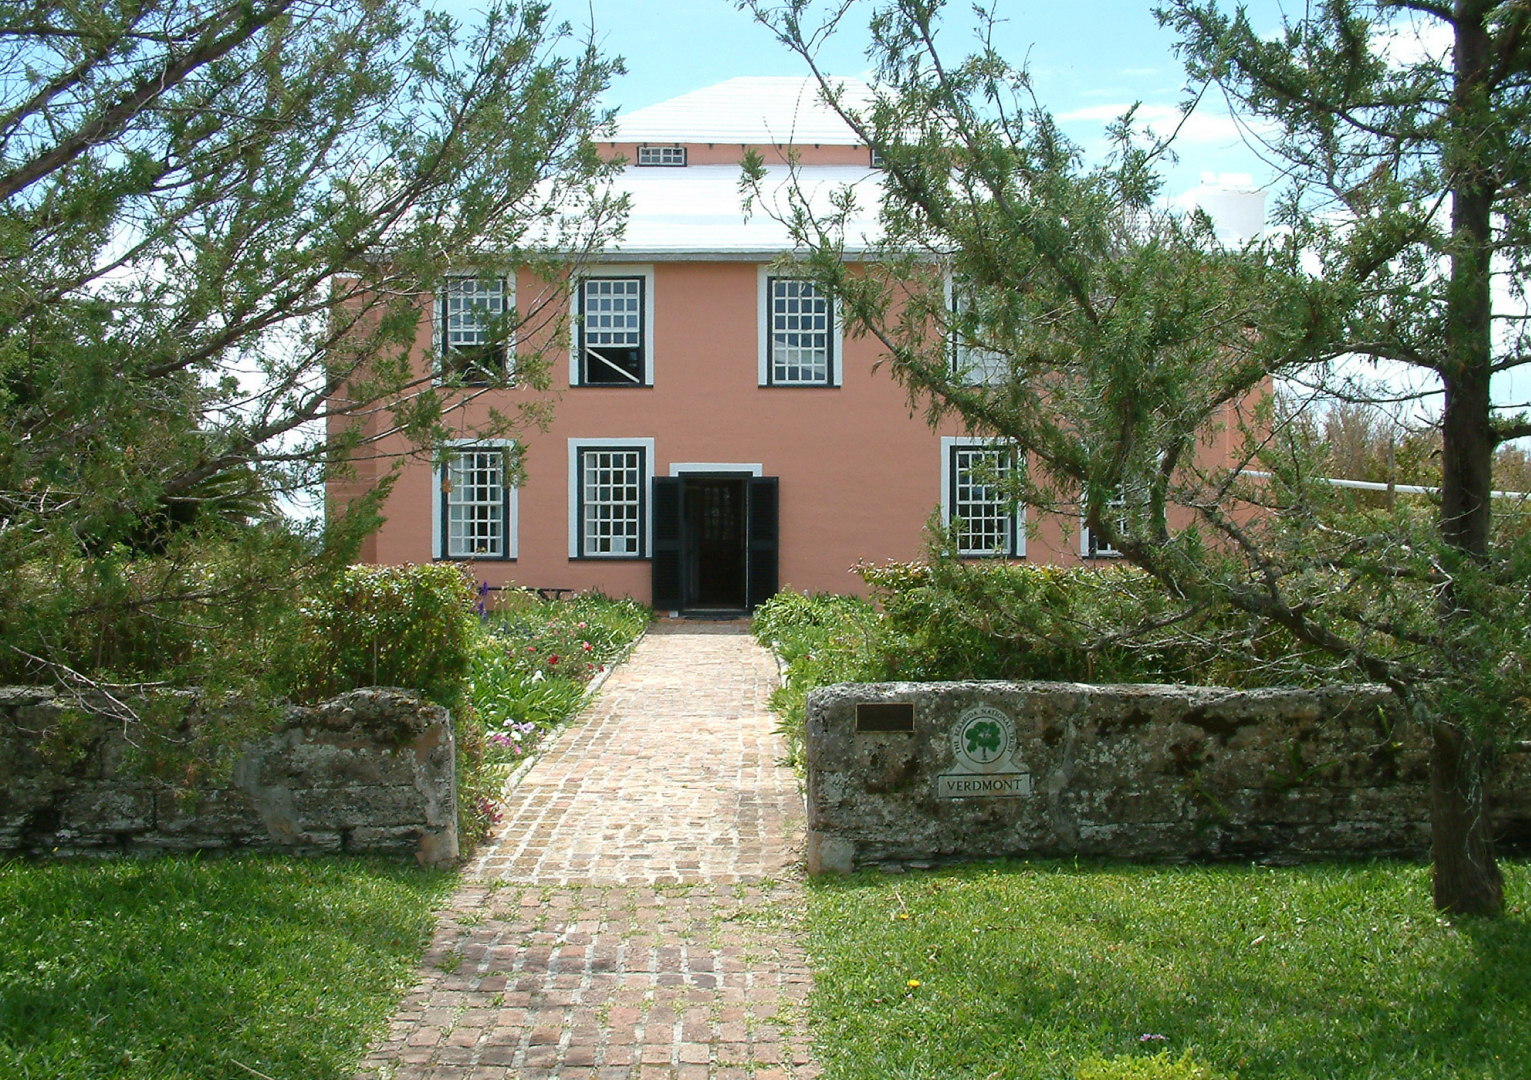 Verdmont House Museum